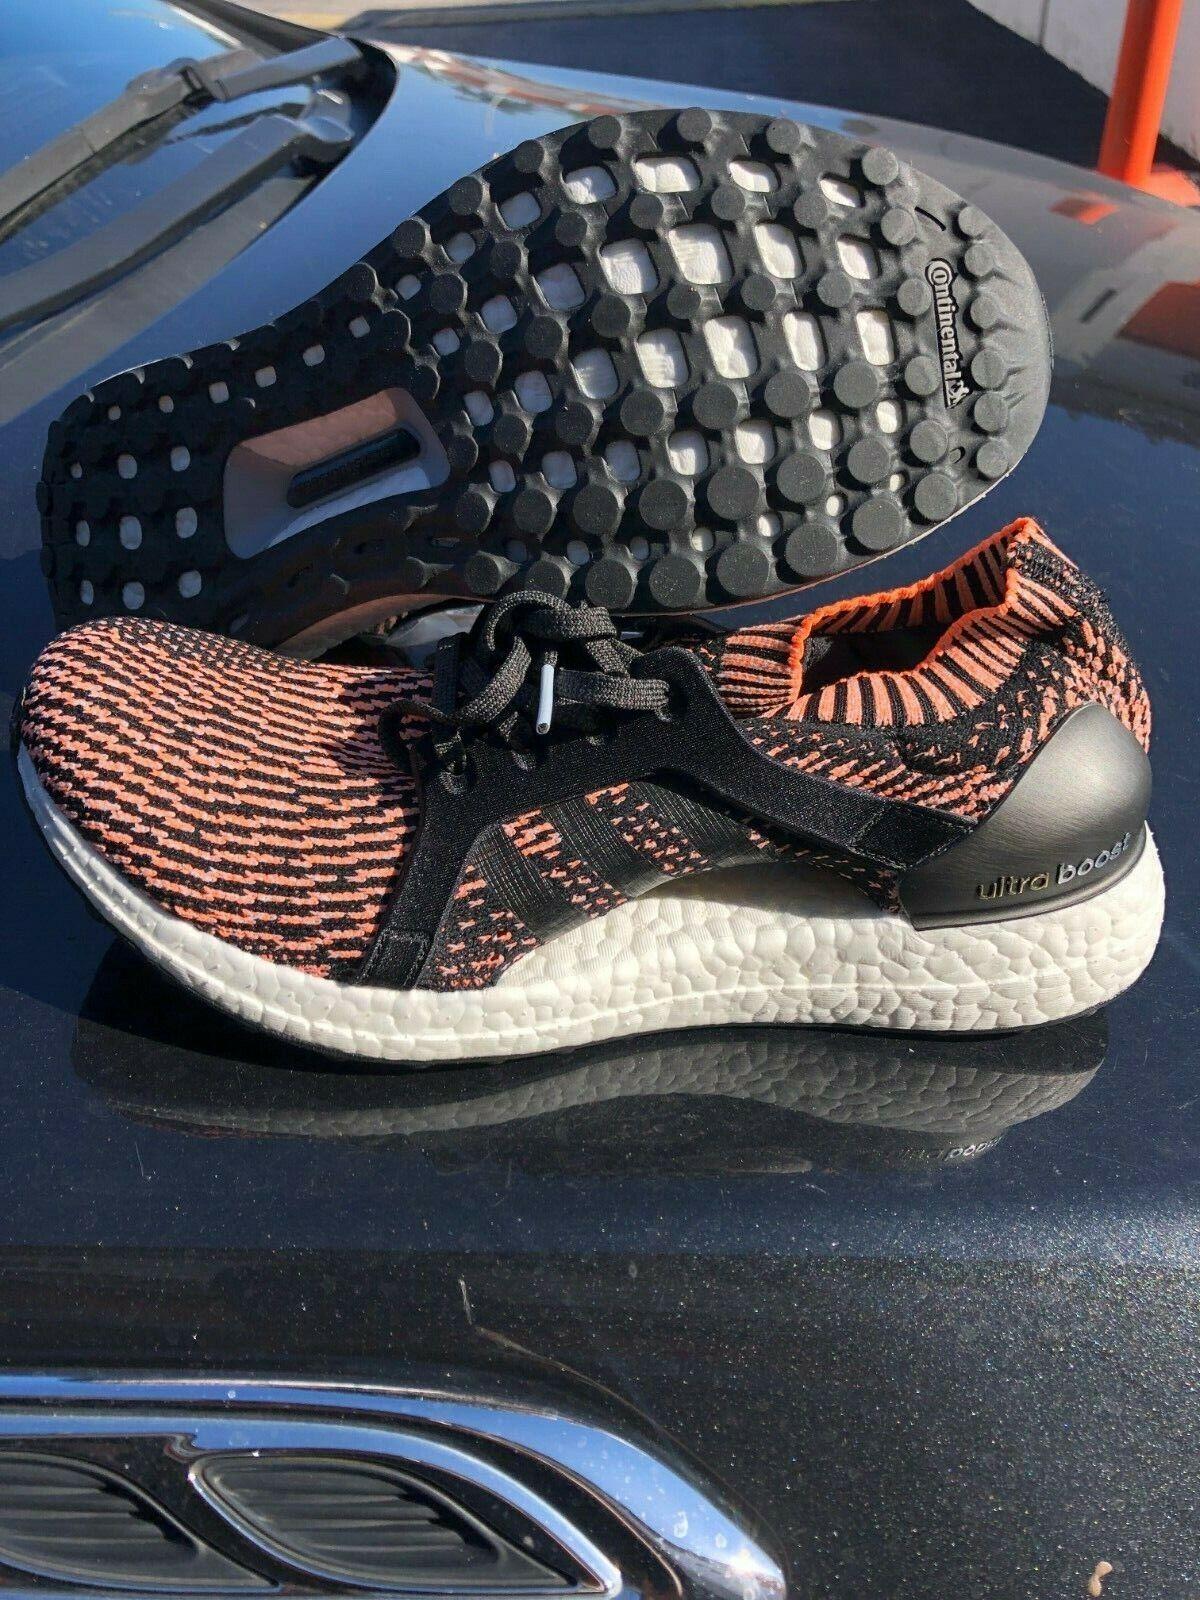 Nuovi  Adidas Ultra Boost X BA8278 Glow arancia Running scarpe Dimensione 9.5  caldo